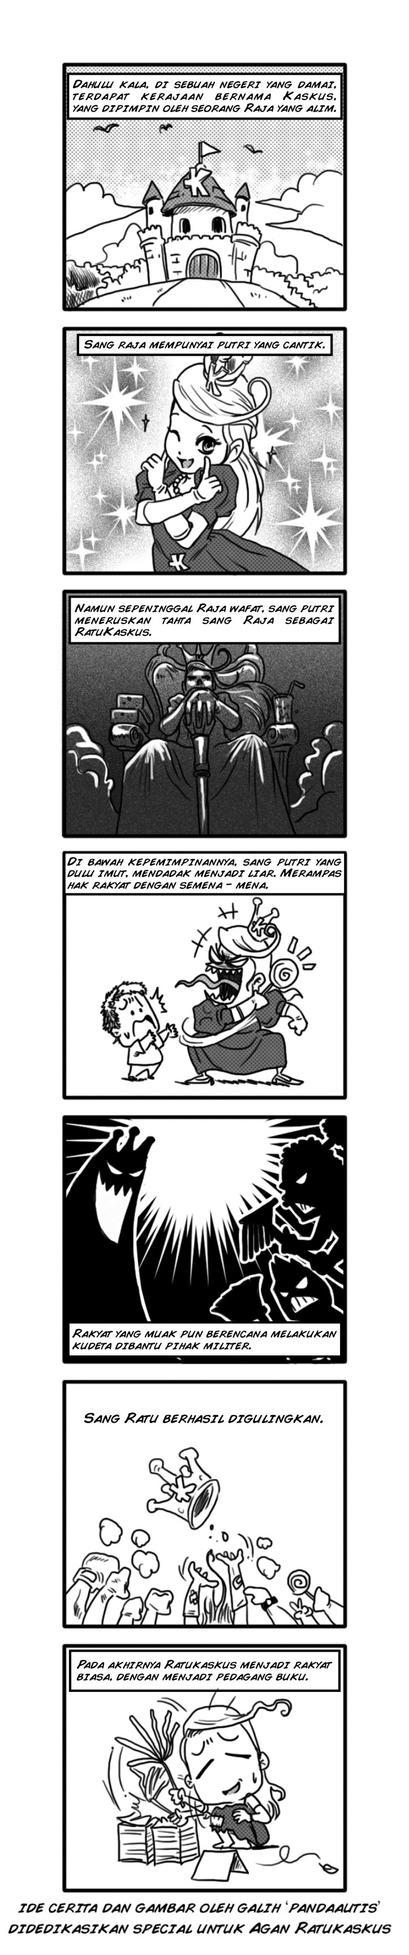 Komik Ratukaskus by pandaautis